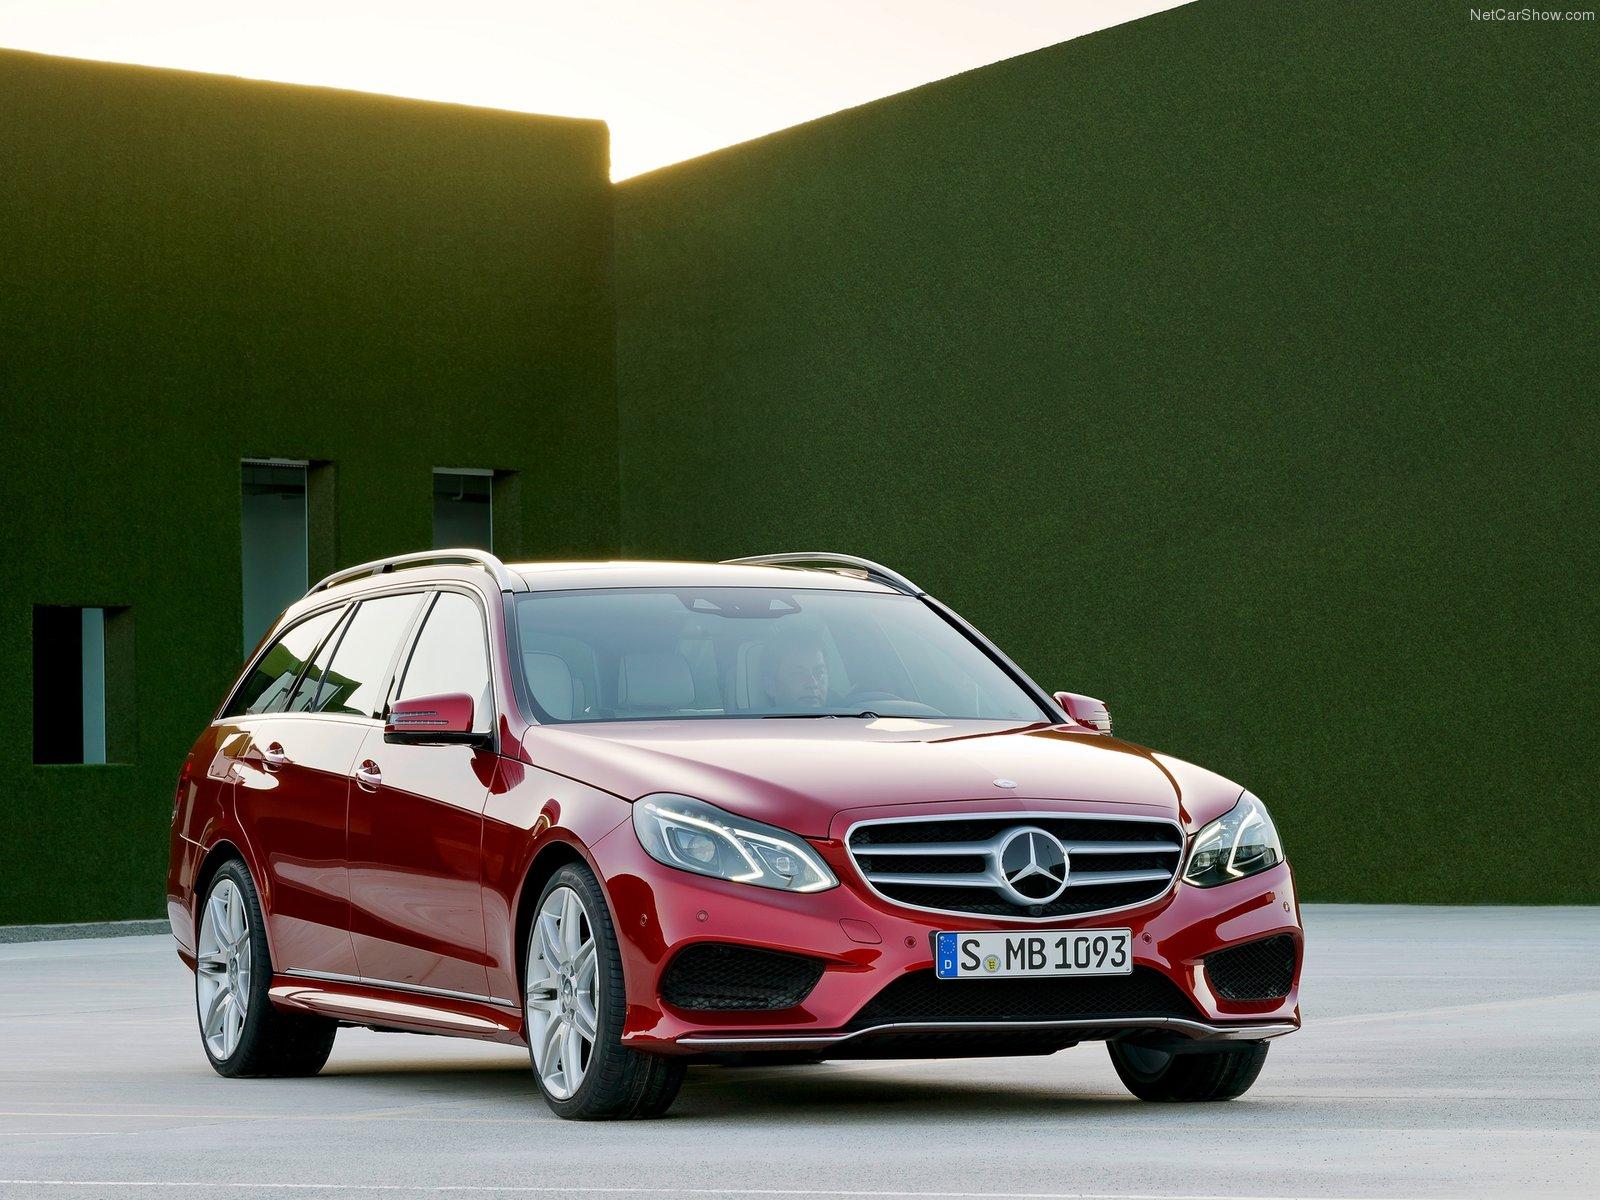 Mercedes-Benz E-Class Estate photos - PhotoGallery with 215 pics ...